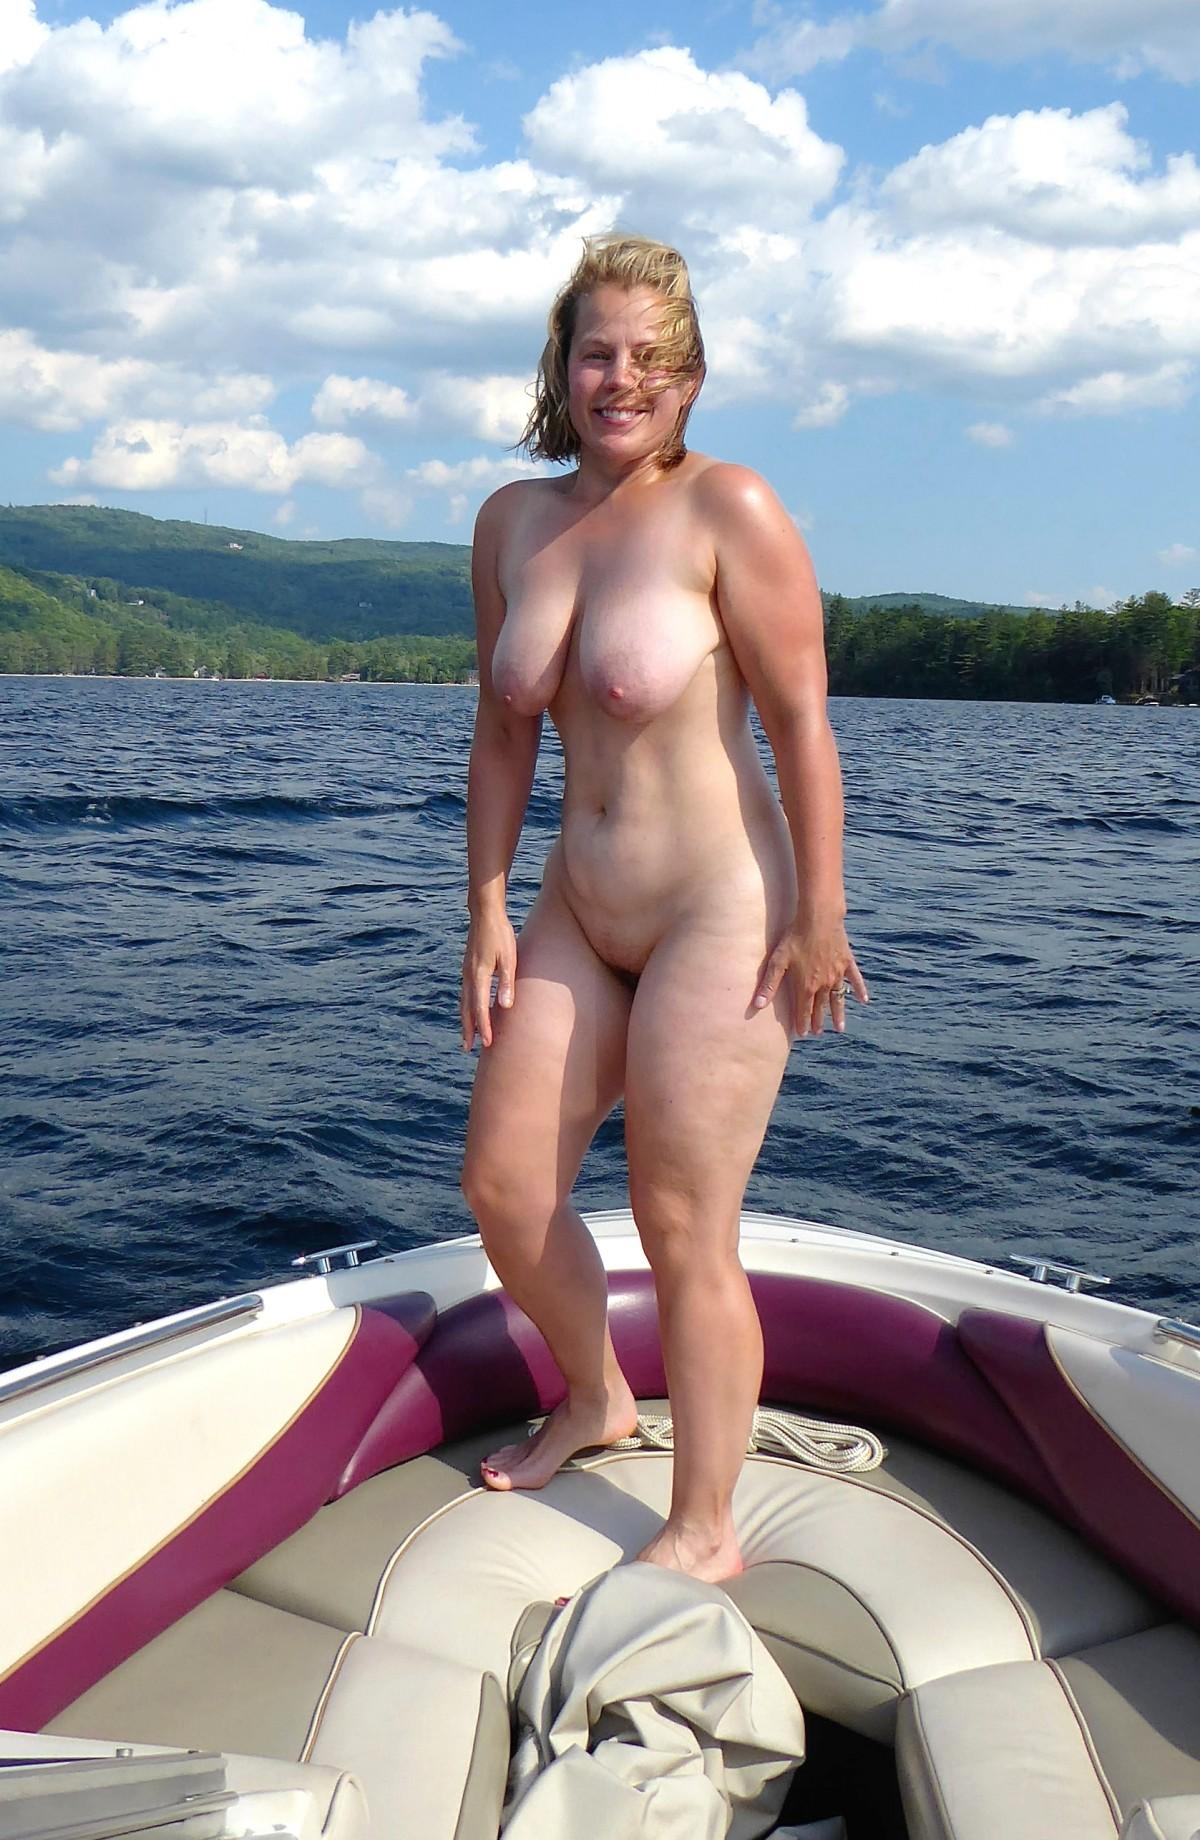 Nude Boating